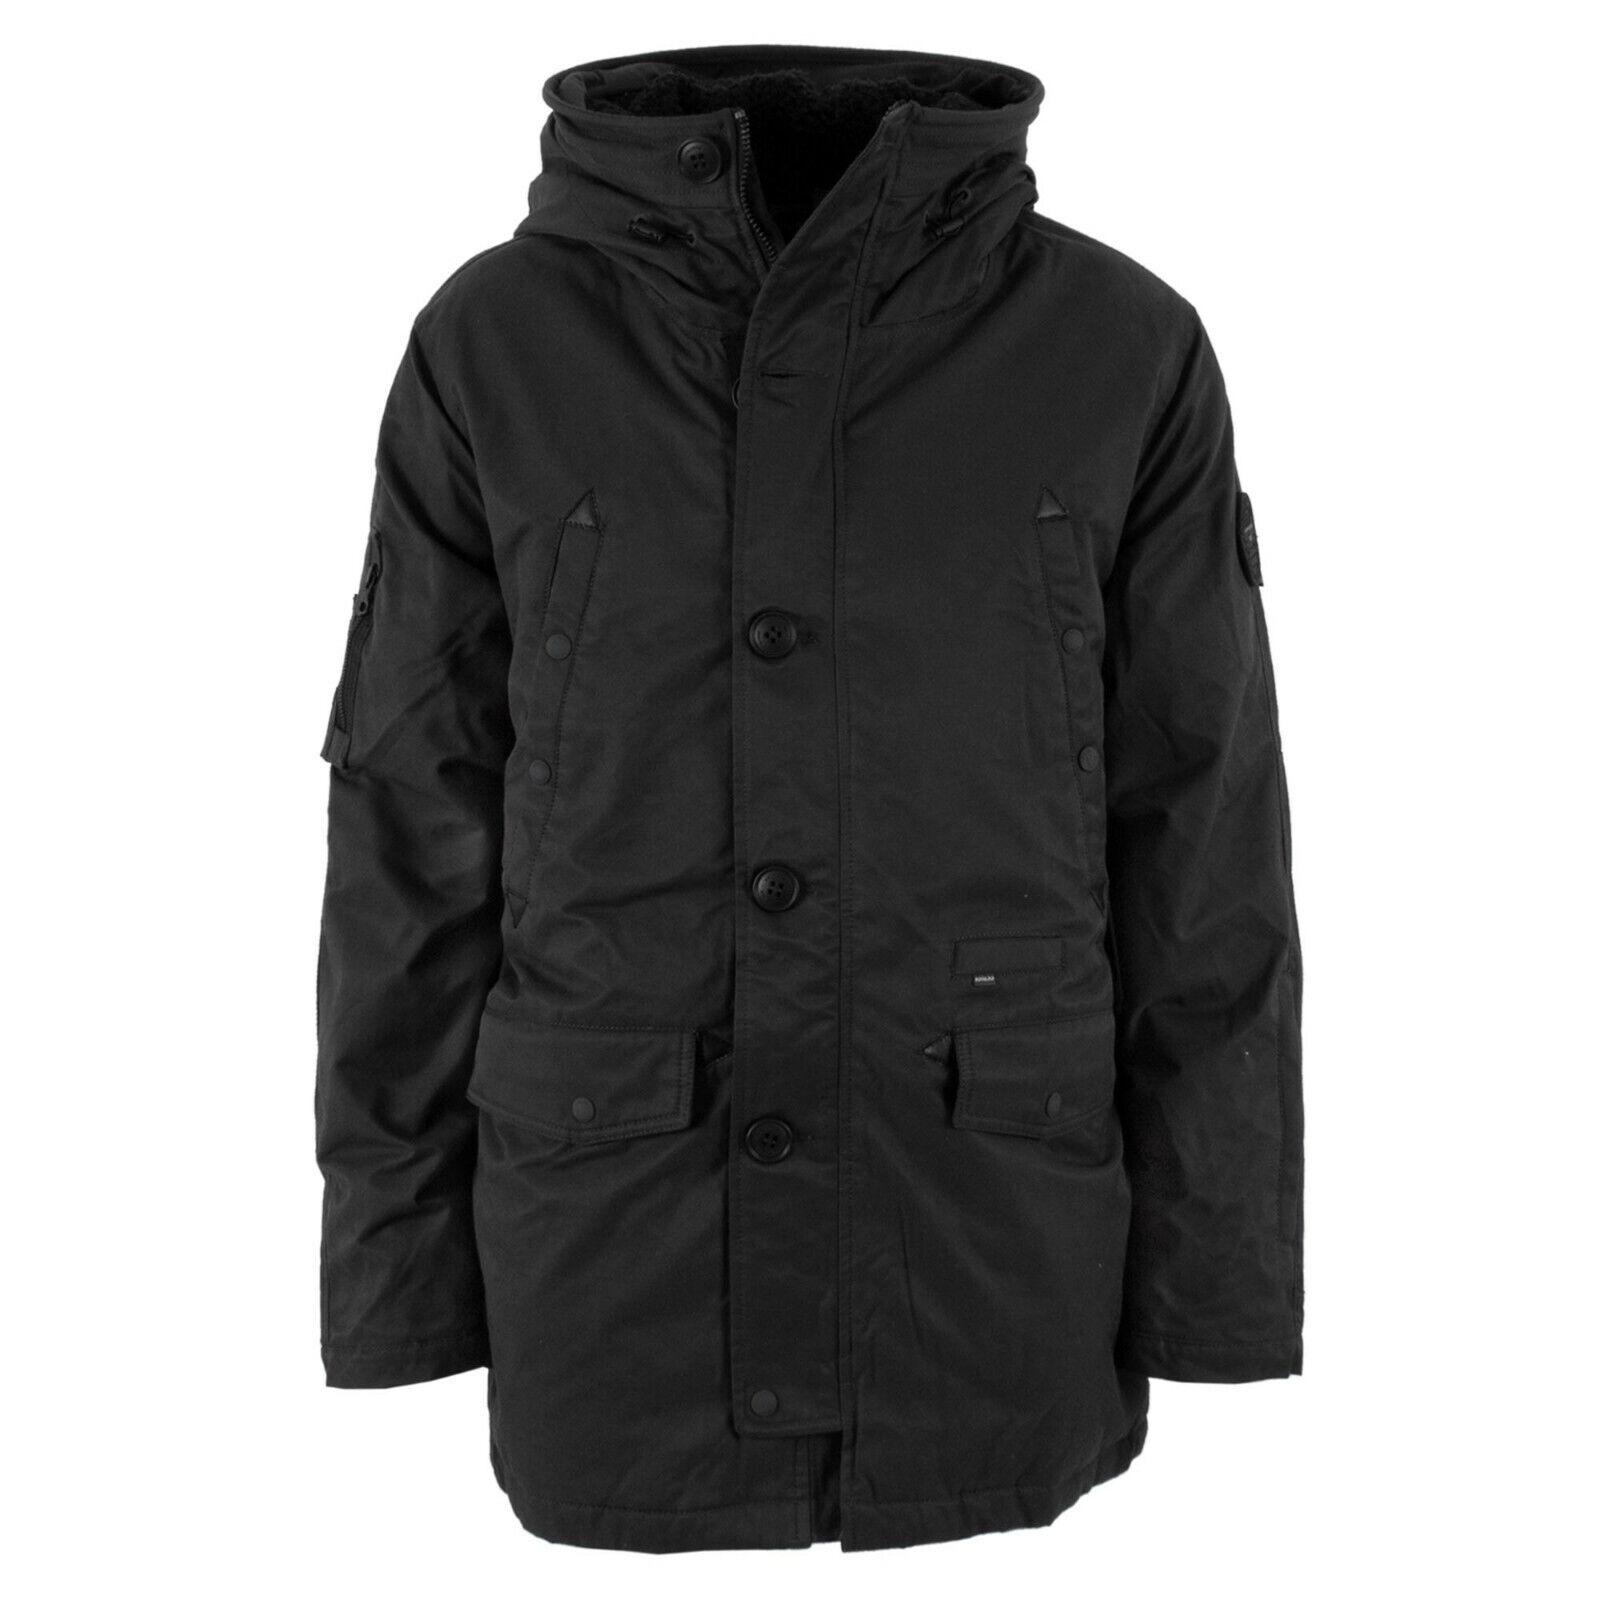 Billabong All Day Puffer black Herrenjacke Jacke Jacket schwarz black Z1JK04BIF6